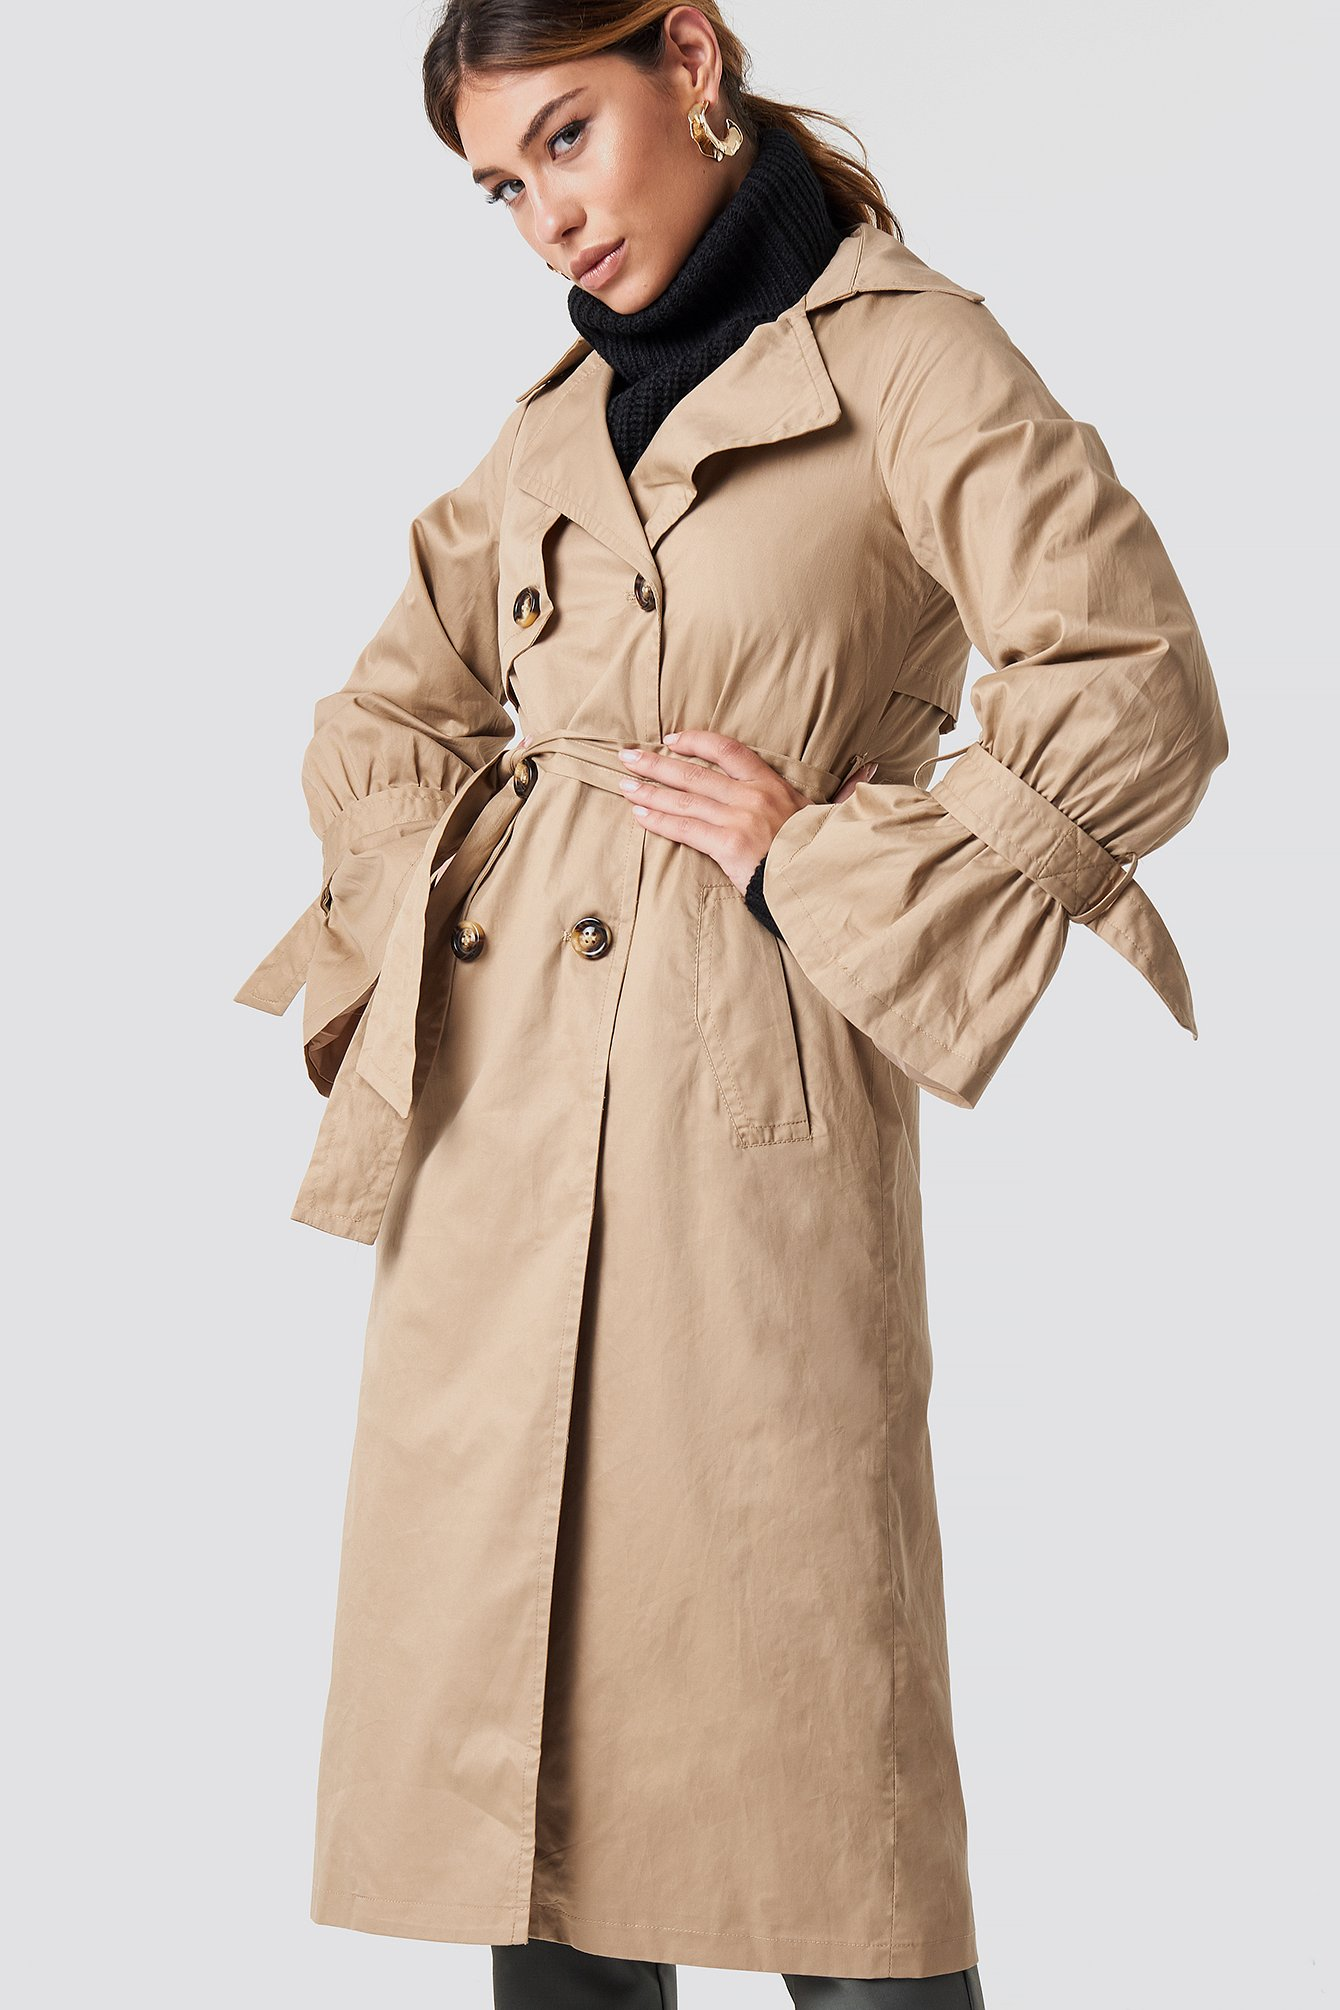 glamorous -  Stone Trench Coat - Beige